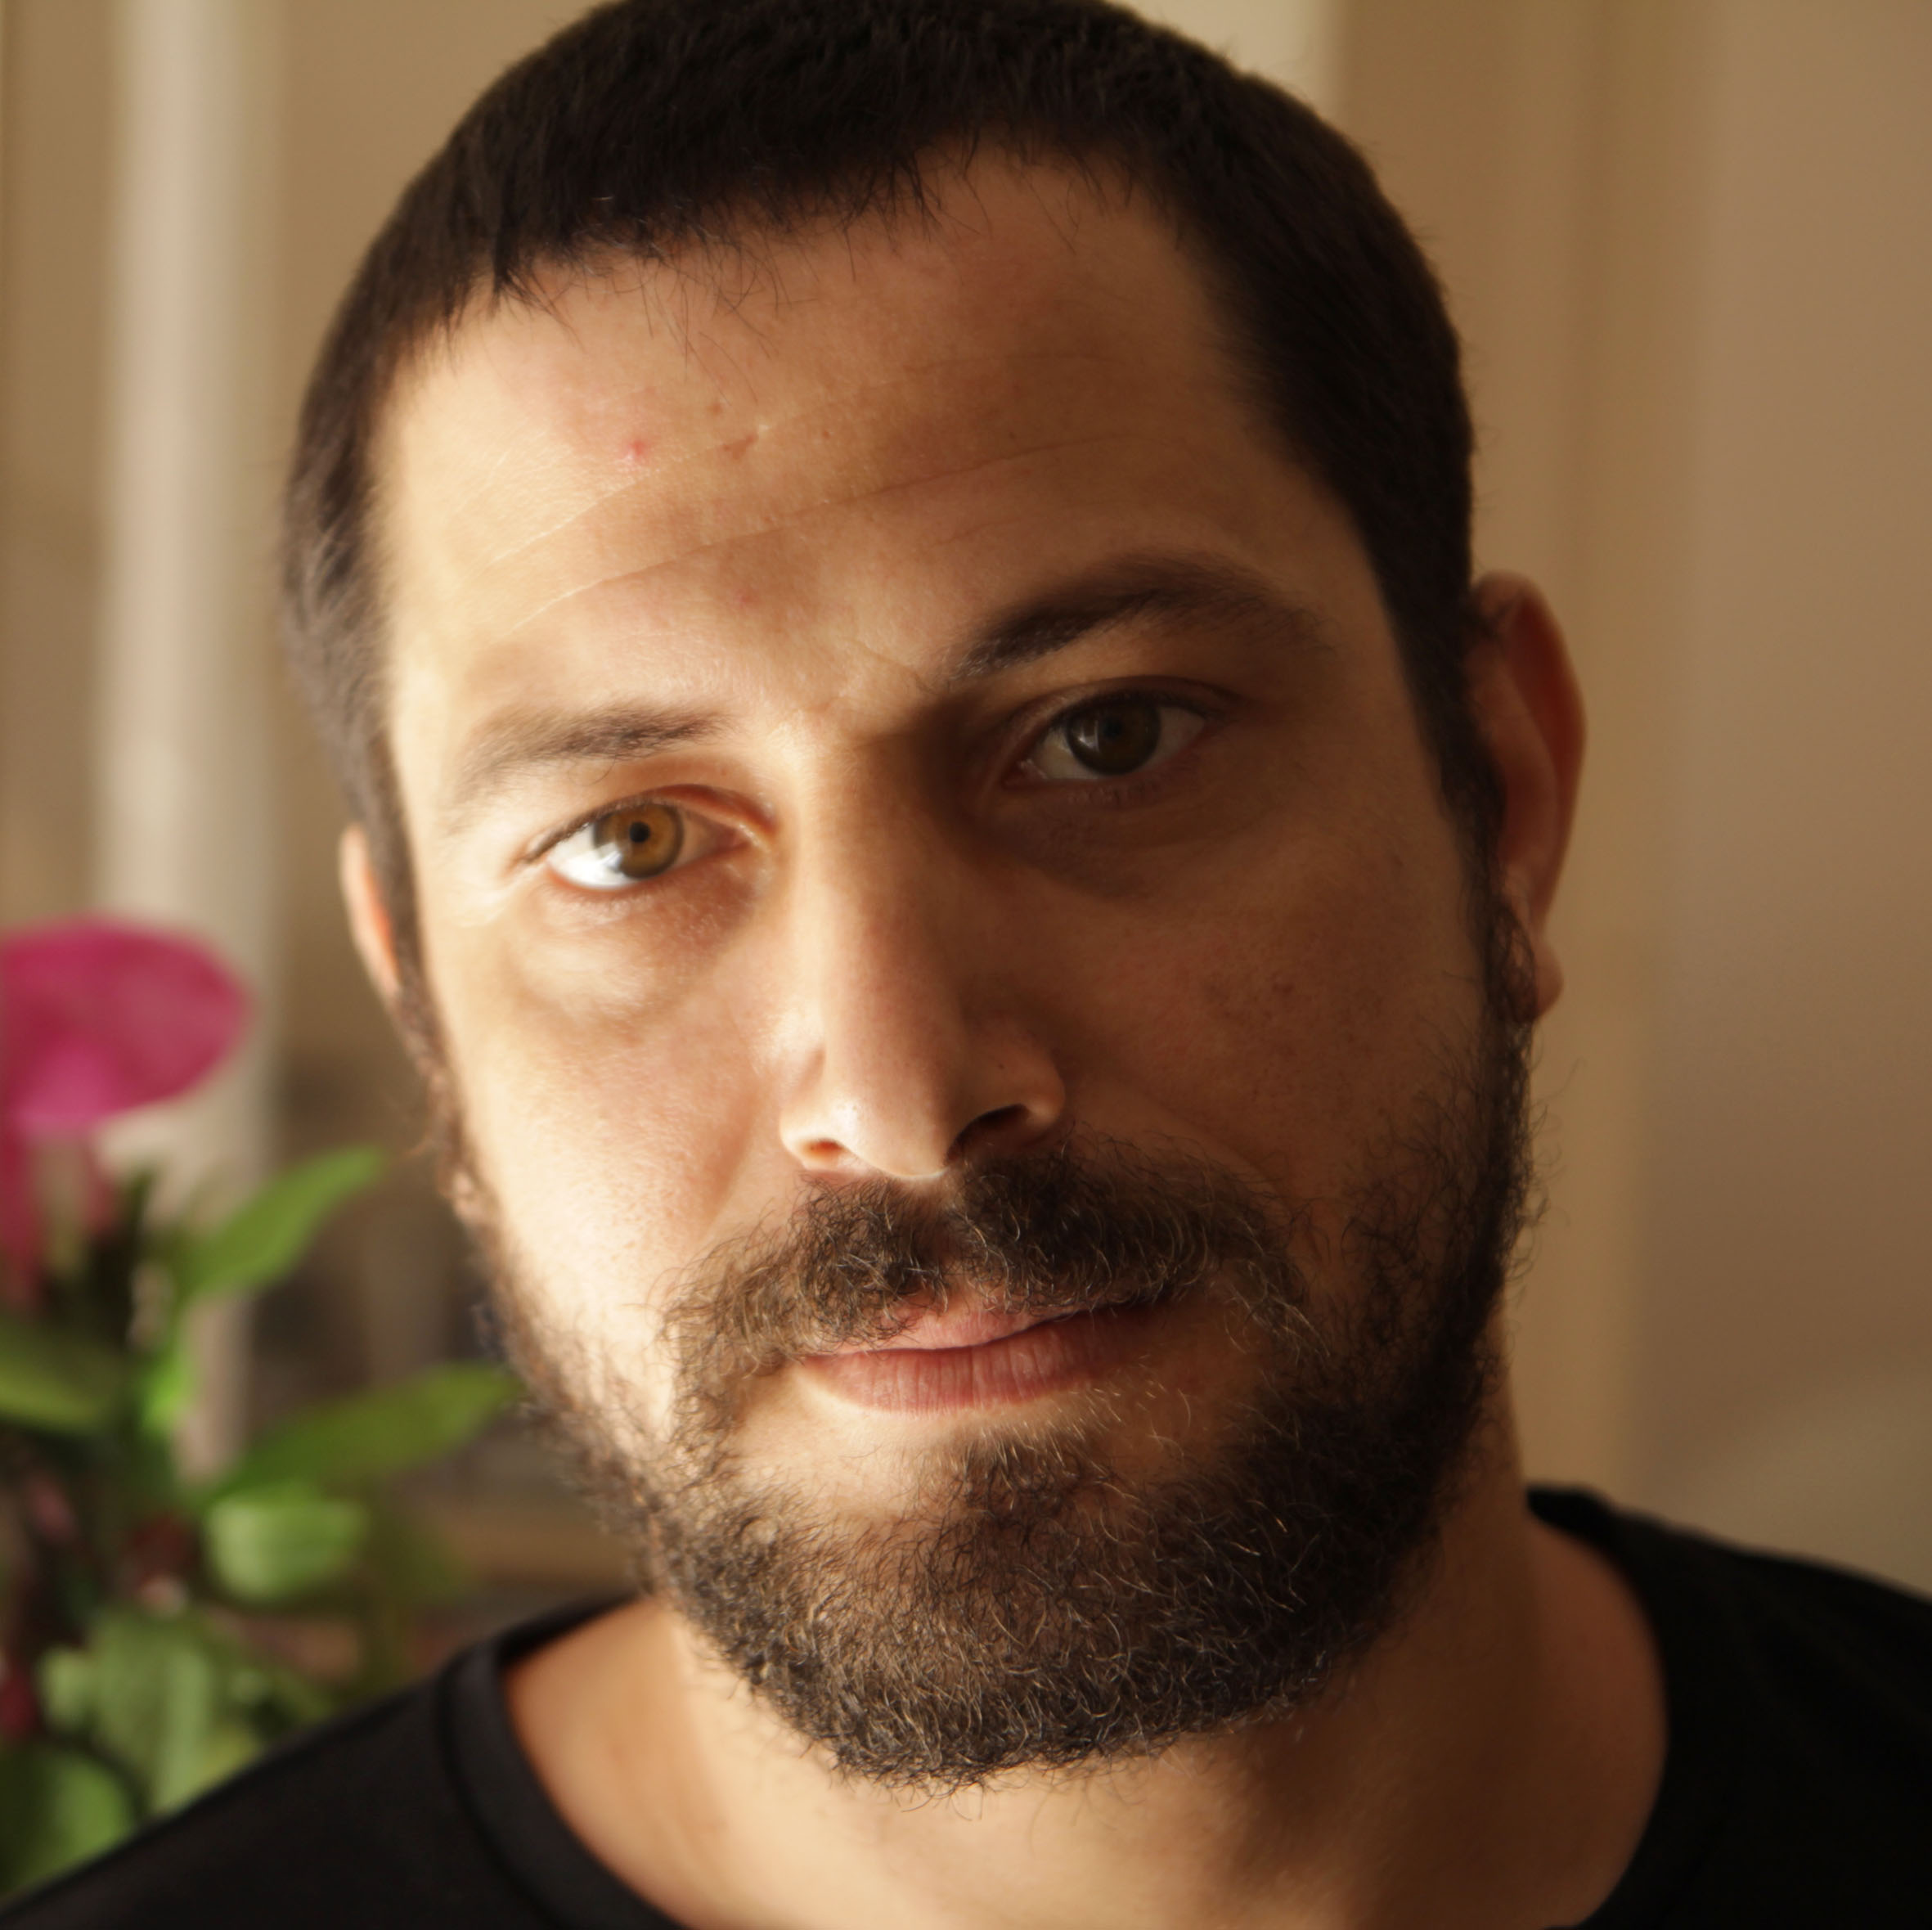 Tawfik Abu Wael